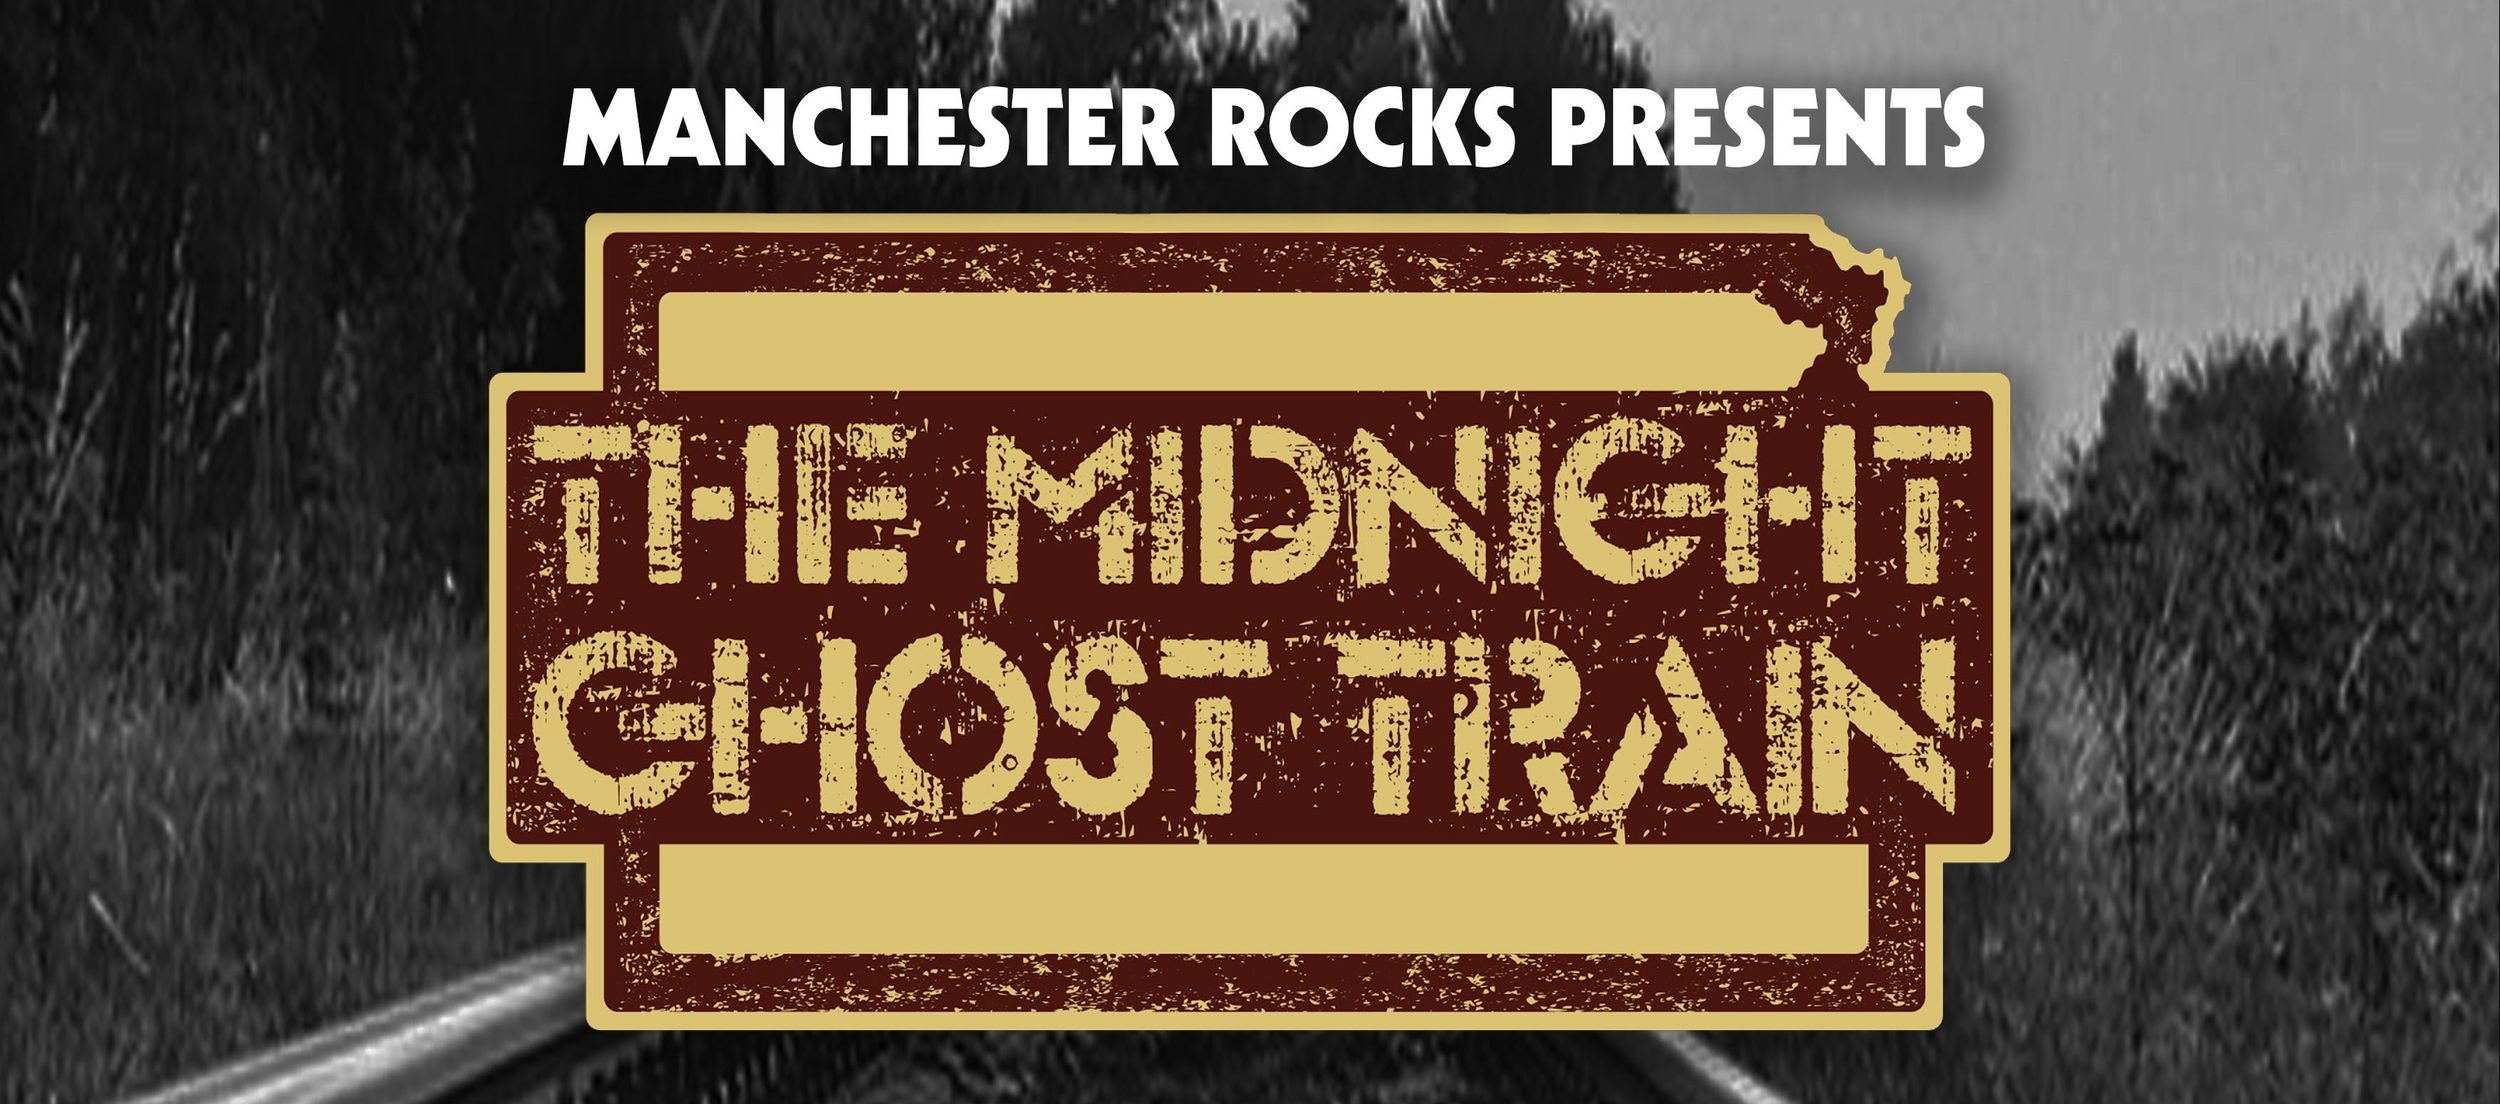 Midnight-Ghost-Train-Poster-Final-1-e1464781404412.jpg